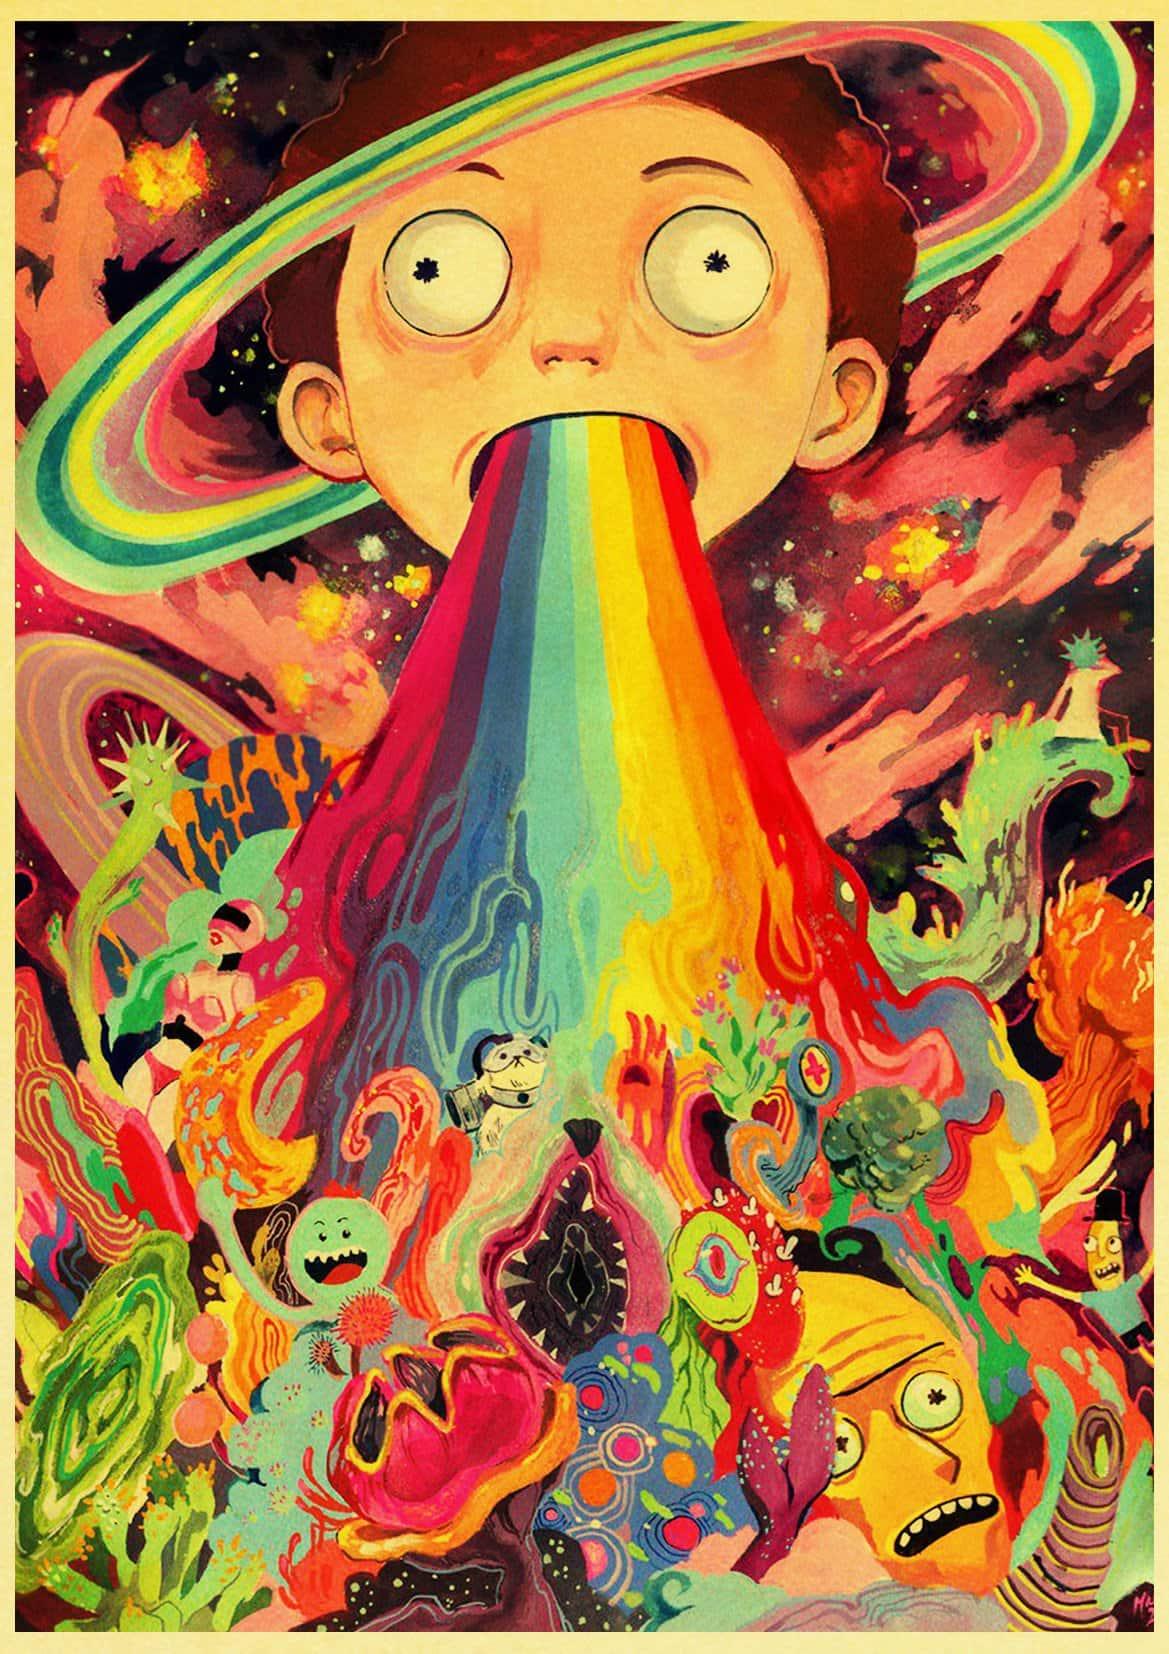 Cute Morty Smith Retro Poster   Rick And Morty Stuff 1169x1654